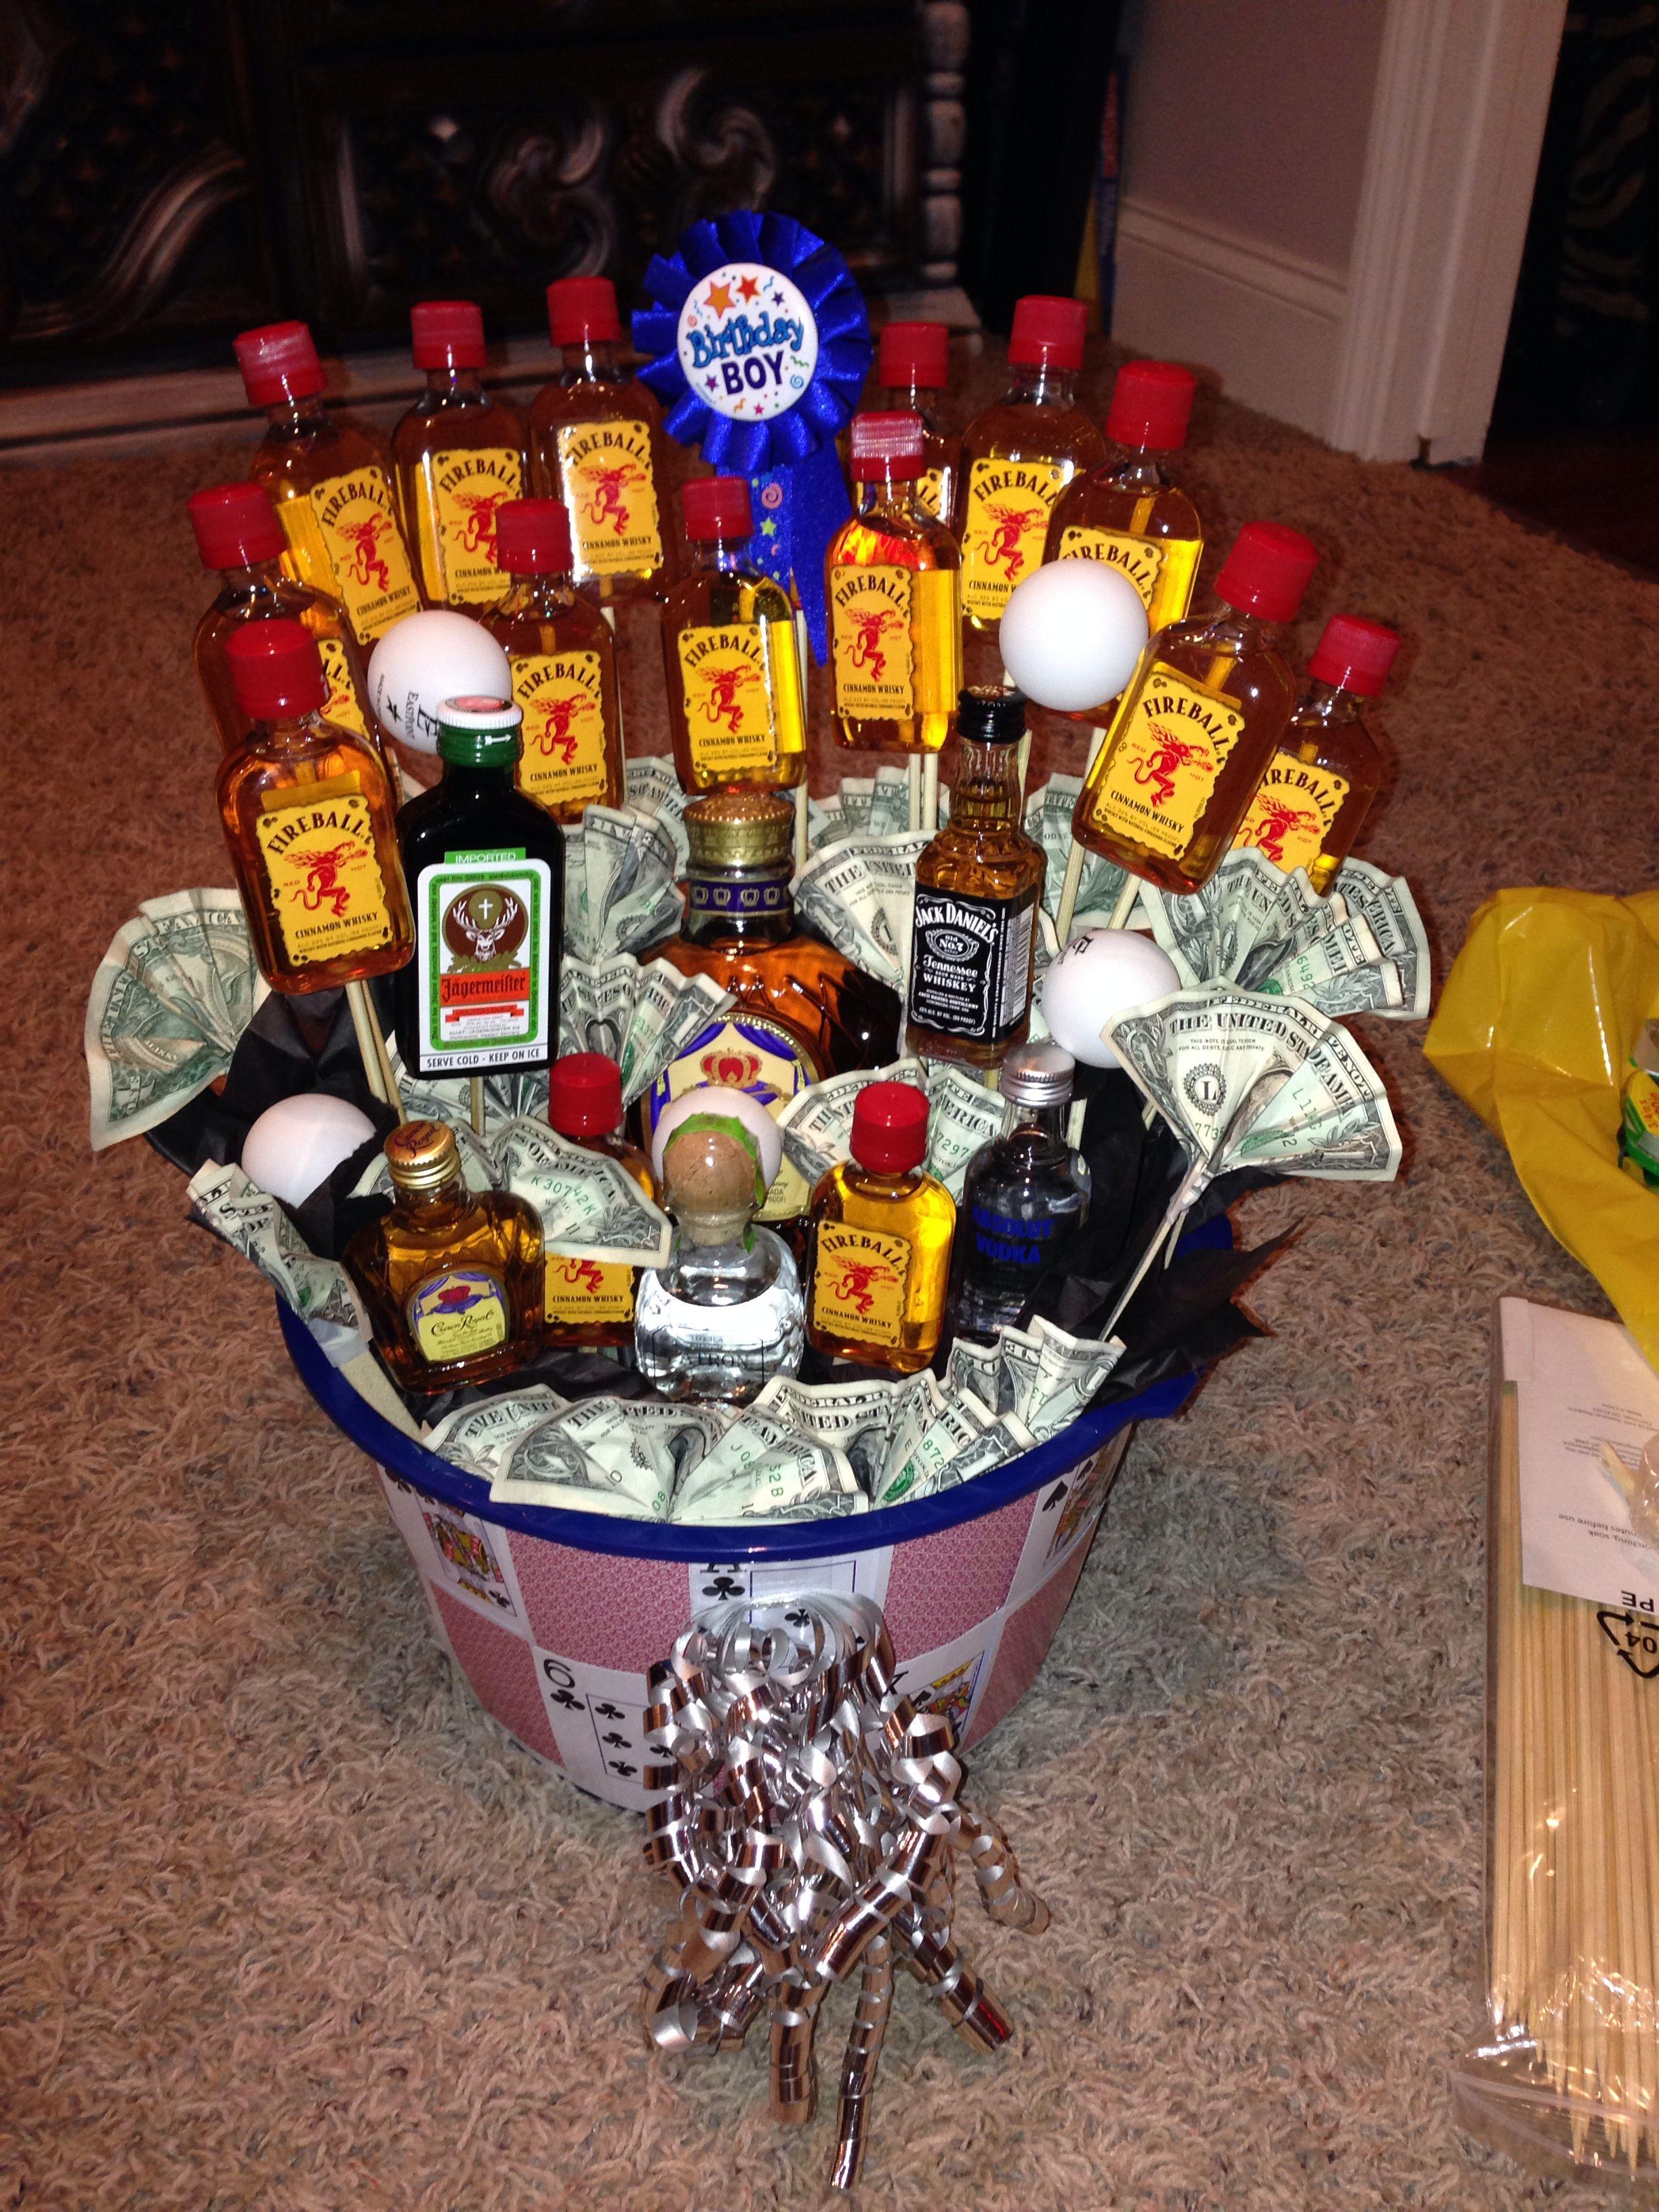 21st birthday basket for boyfriend diy get crafty